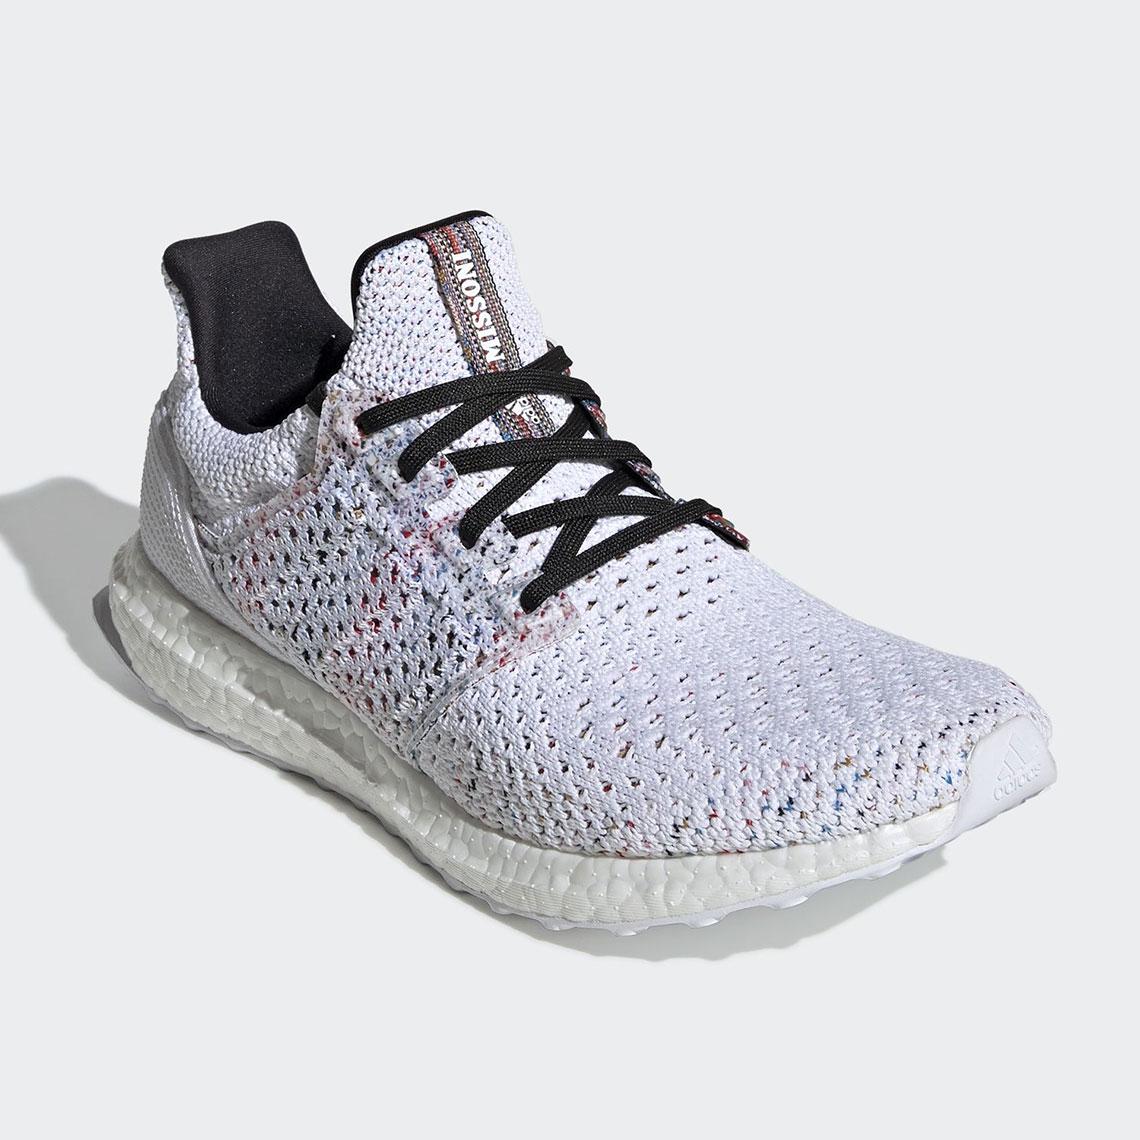 Adidas X Missoni Ultraboost Clima Multi D97771   ORIGINALFOOK